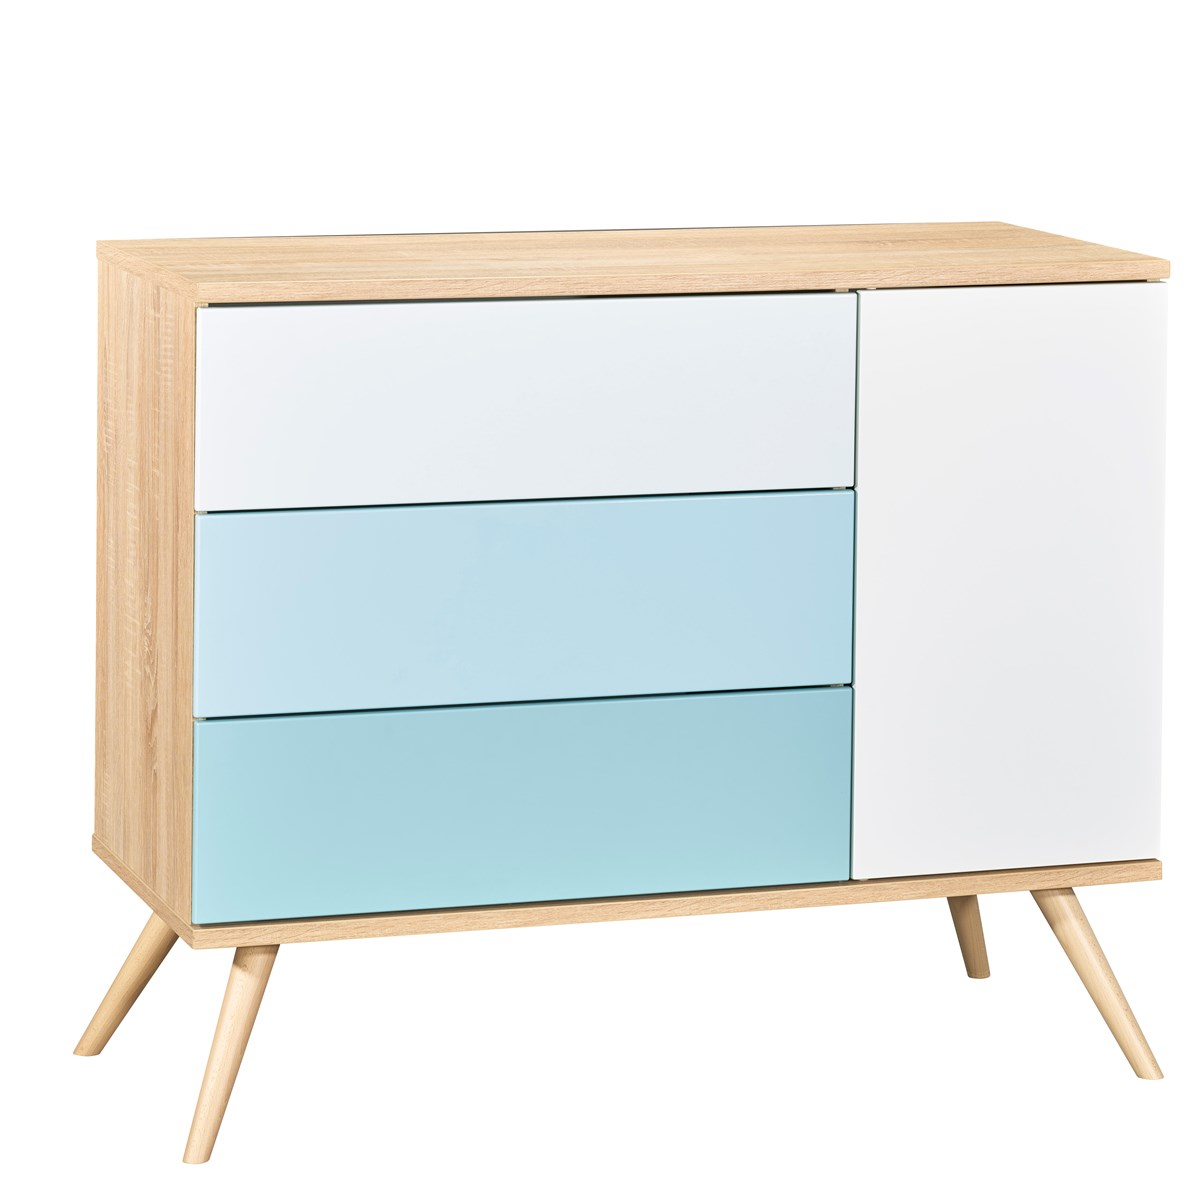 Commode 1 porte et 3 tiroirs en bois bleu